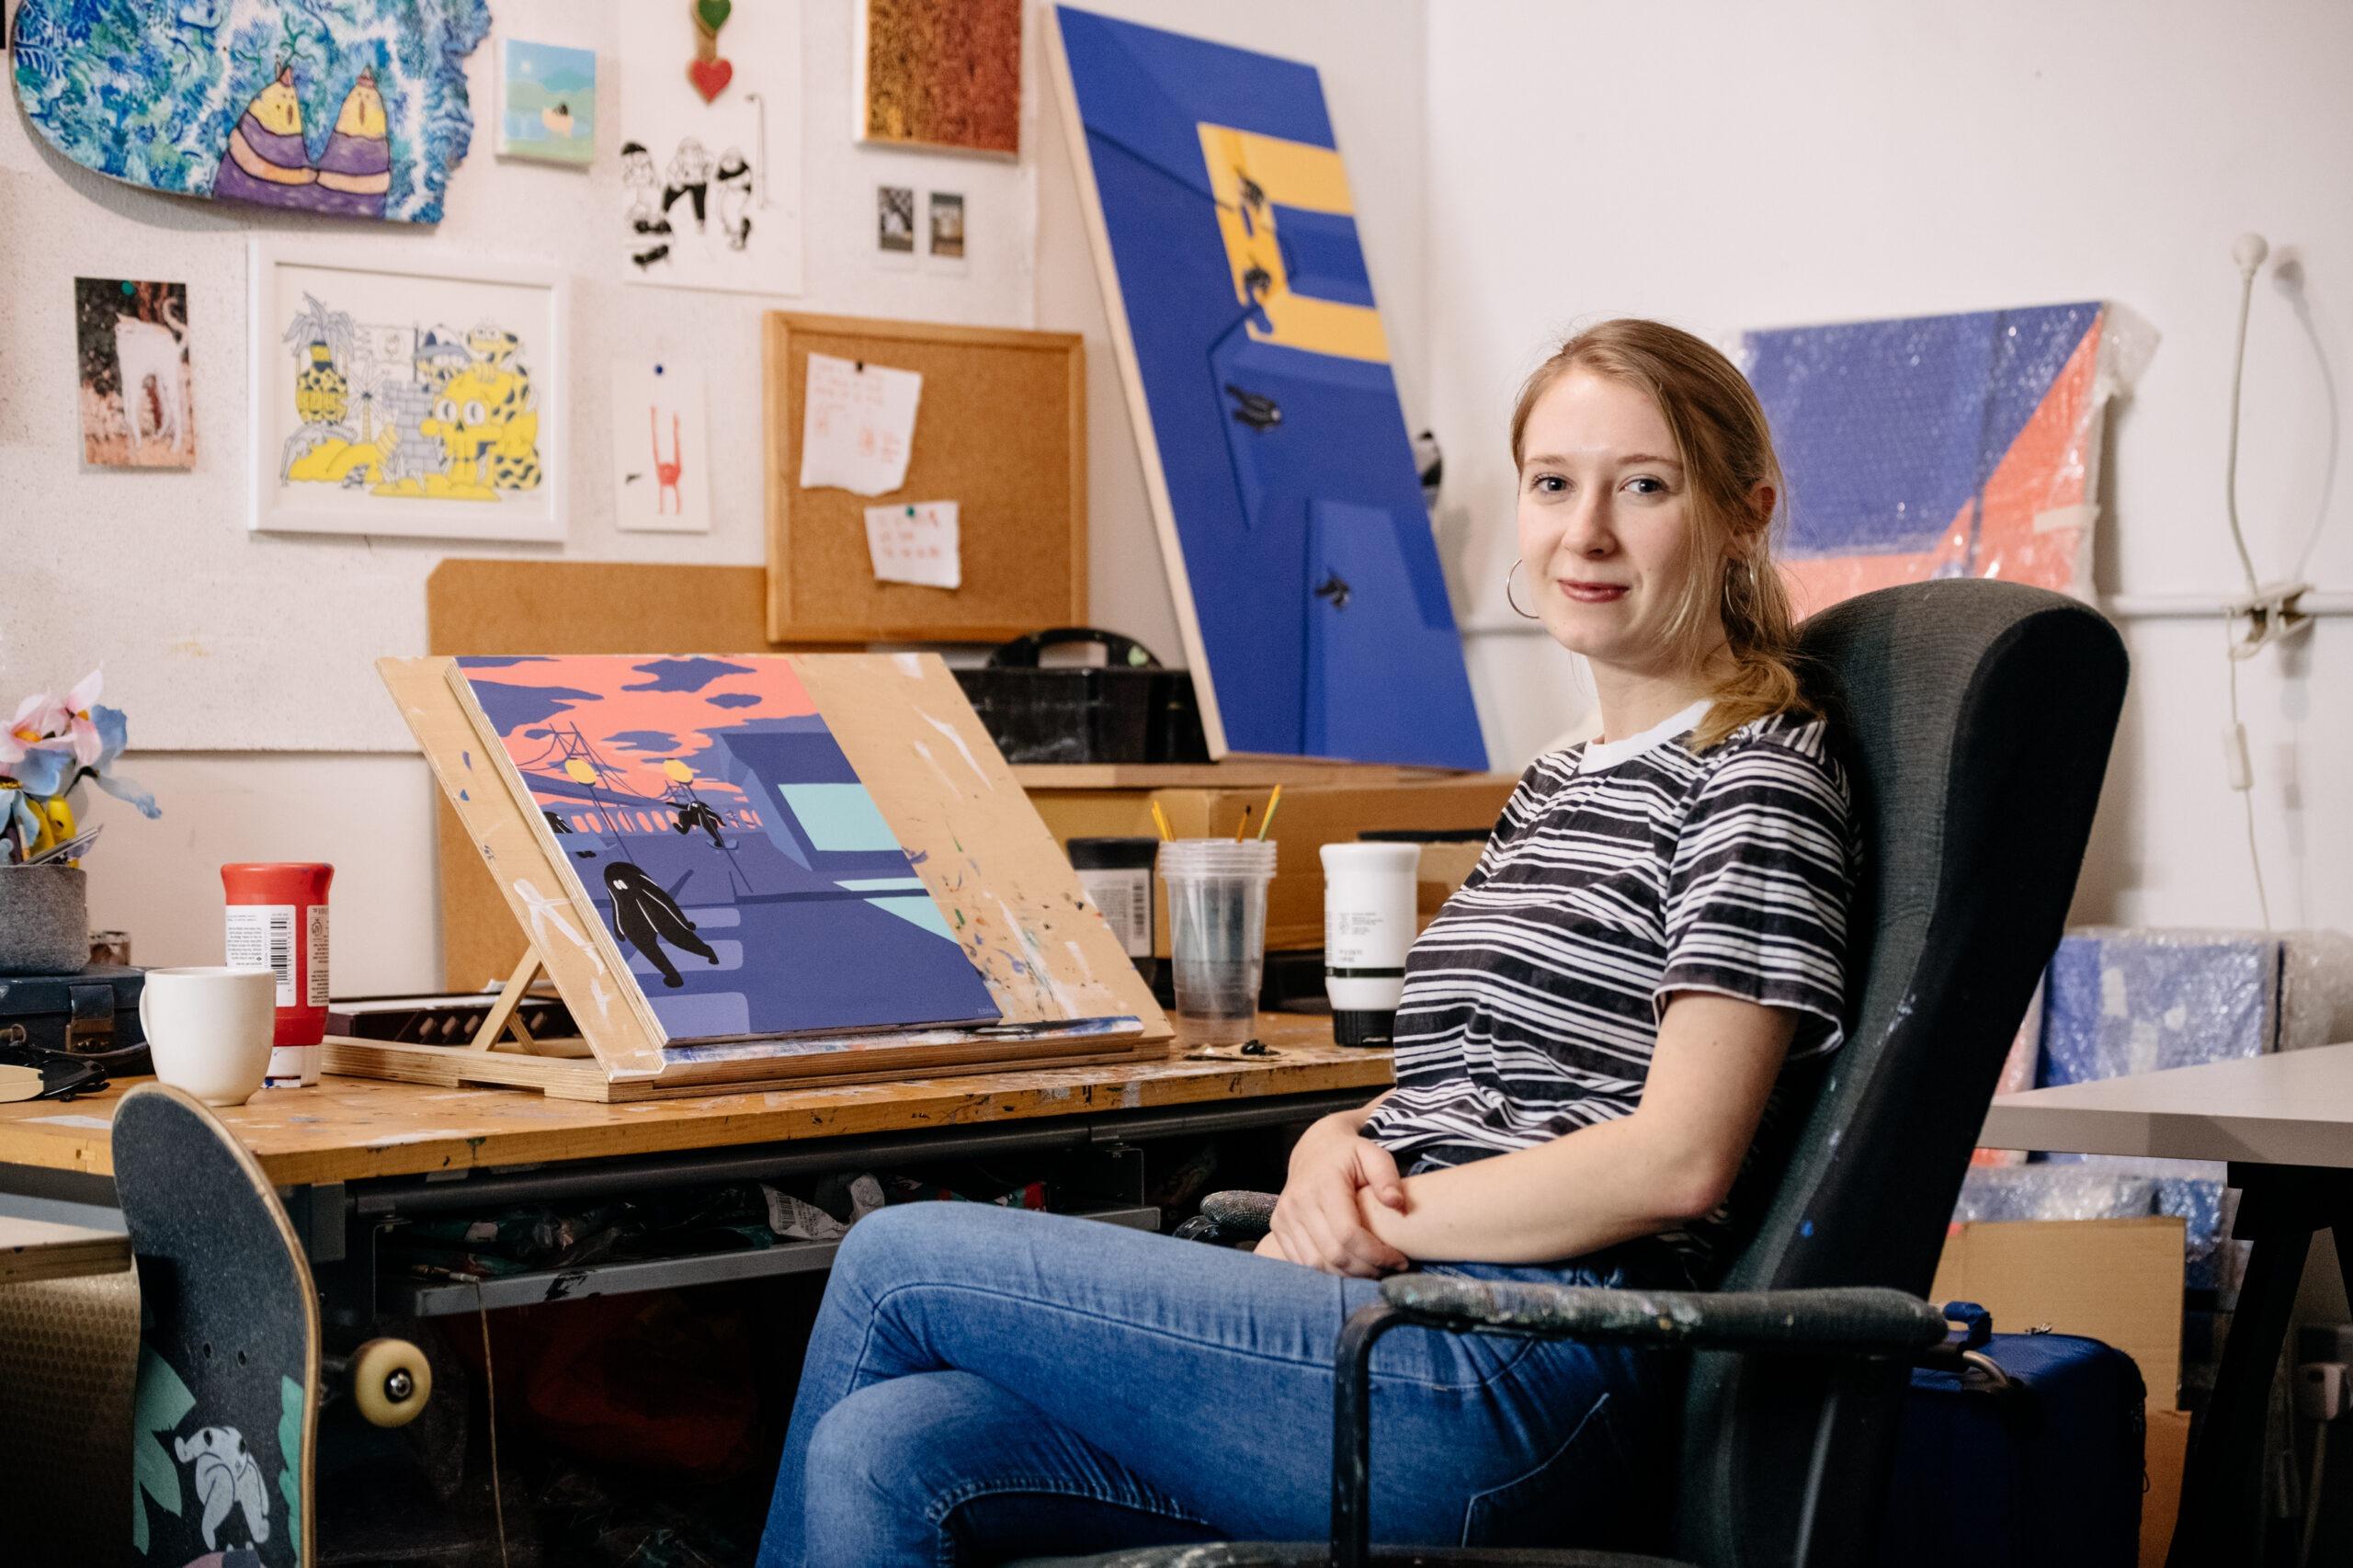 Eloise Dör Illustrator sitting at her desk